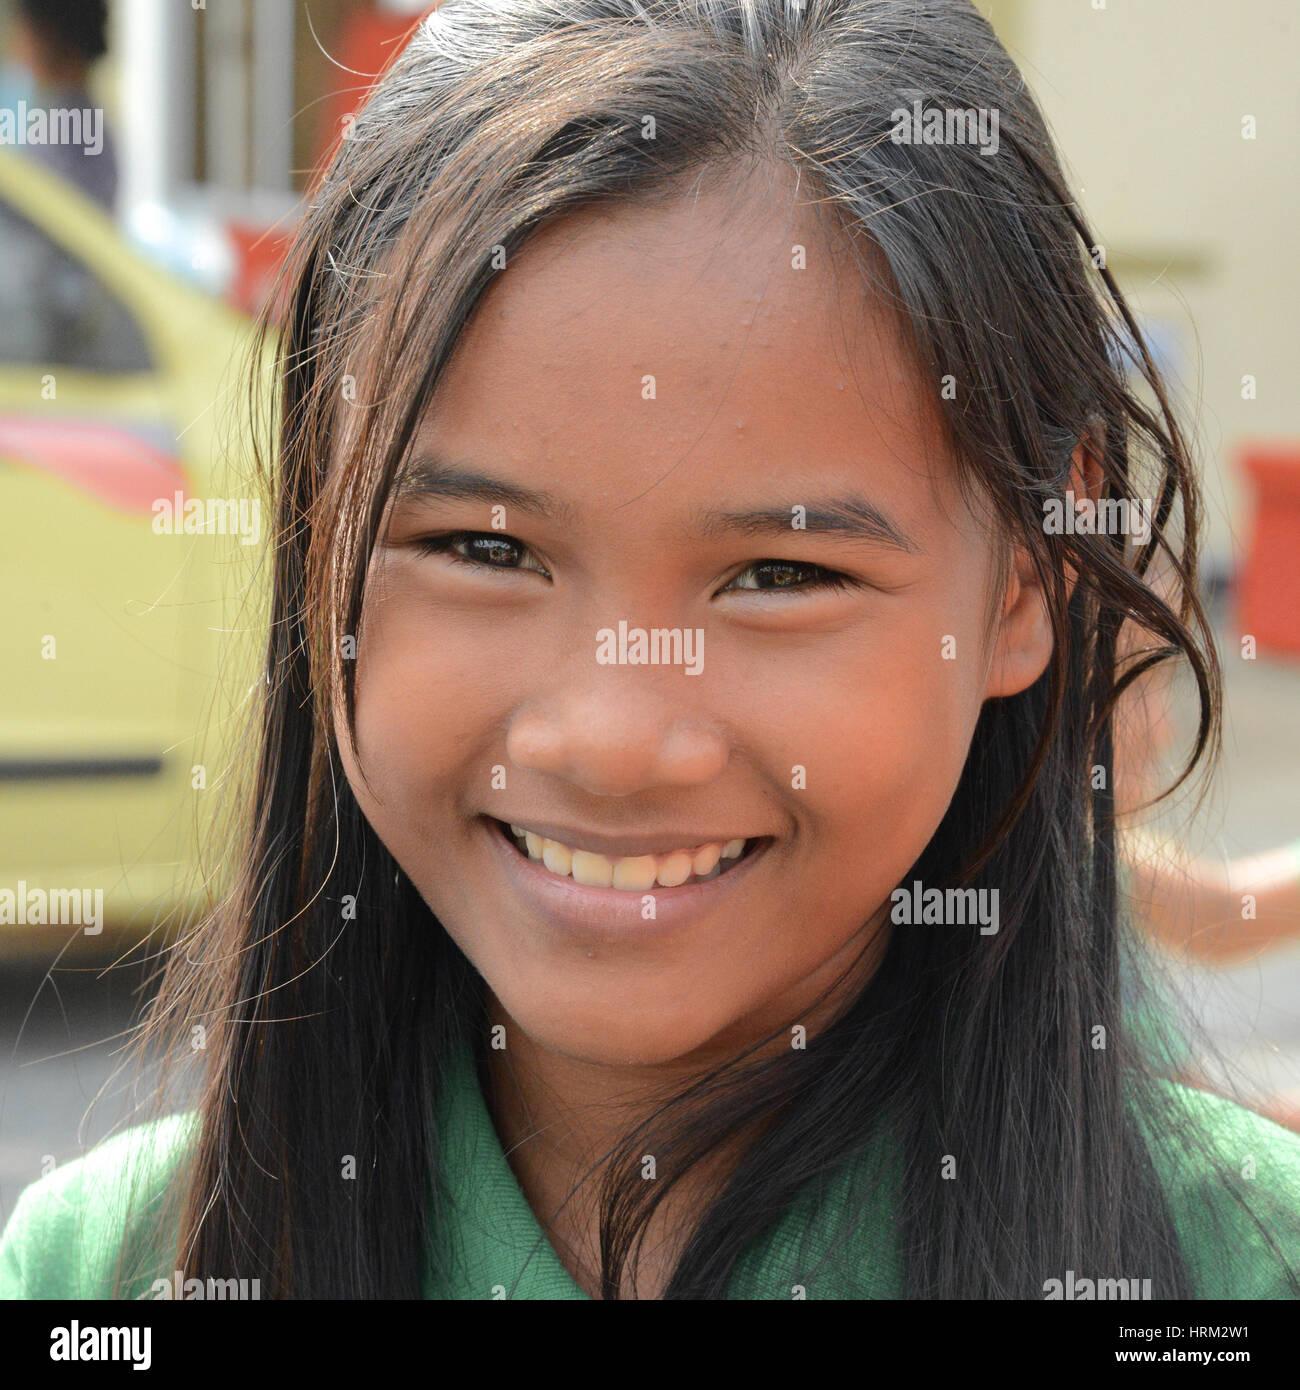 Children of Cambodia - Stock Image